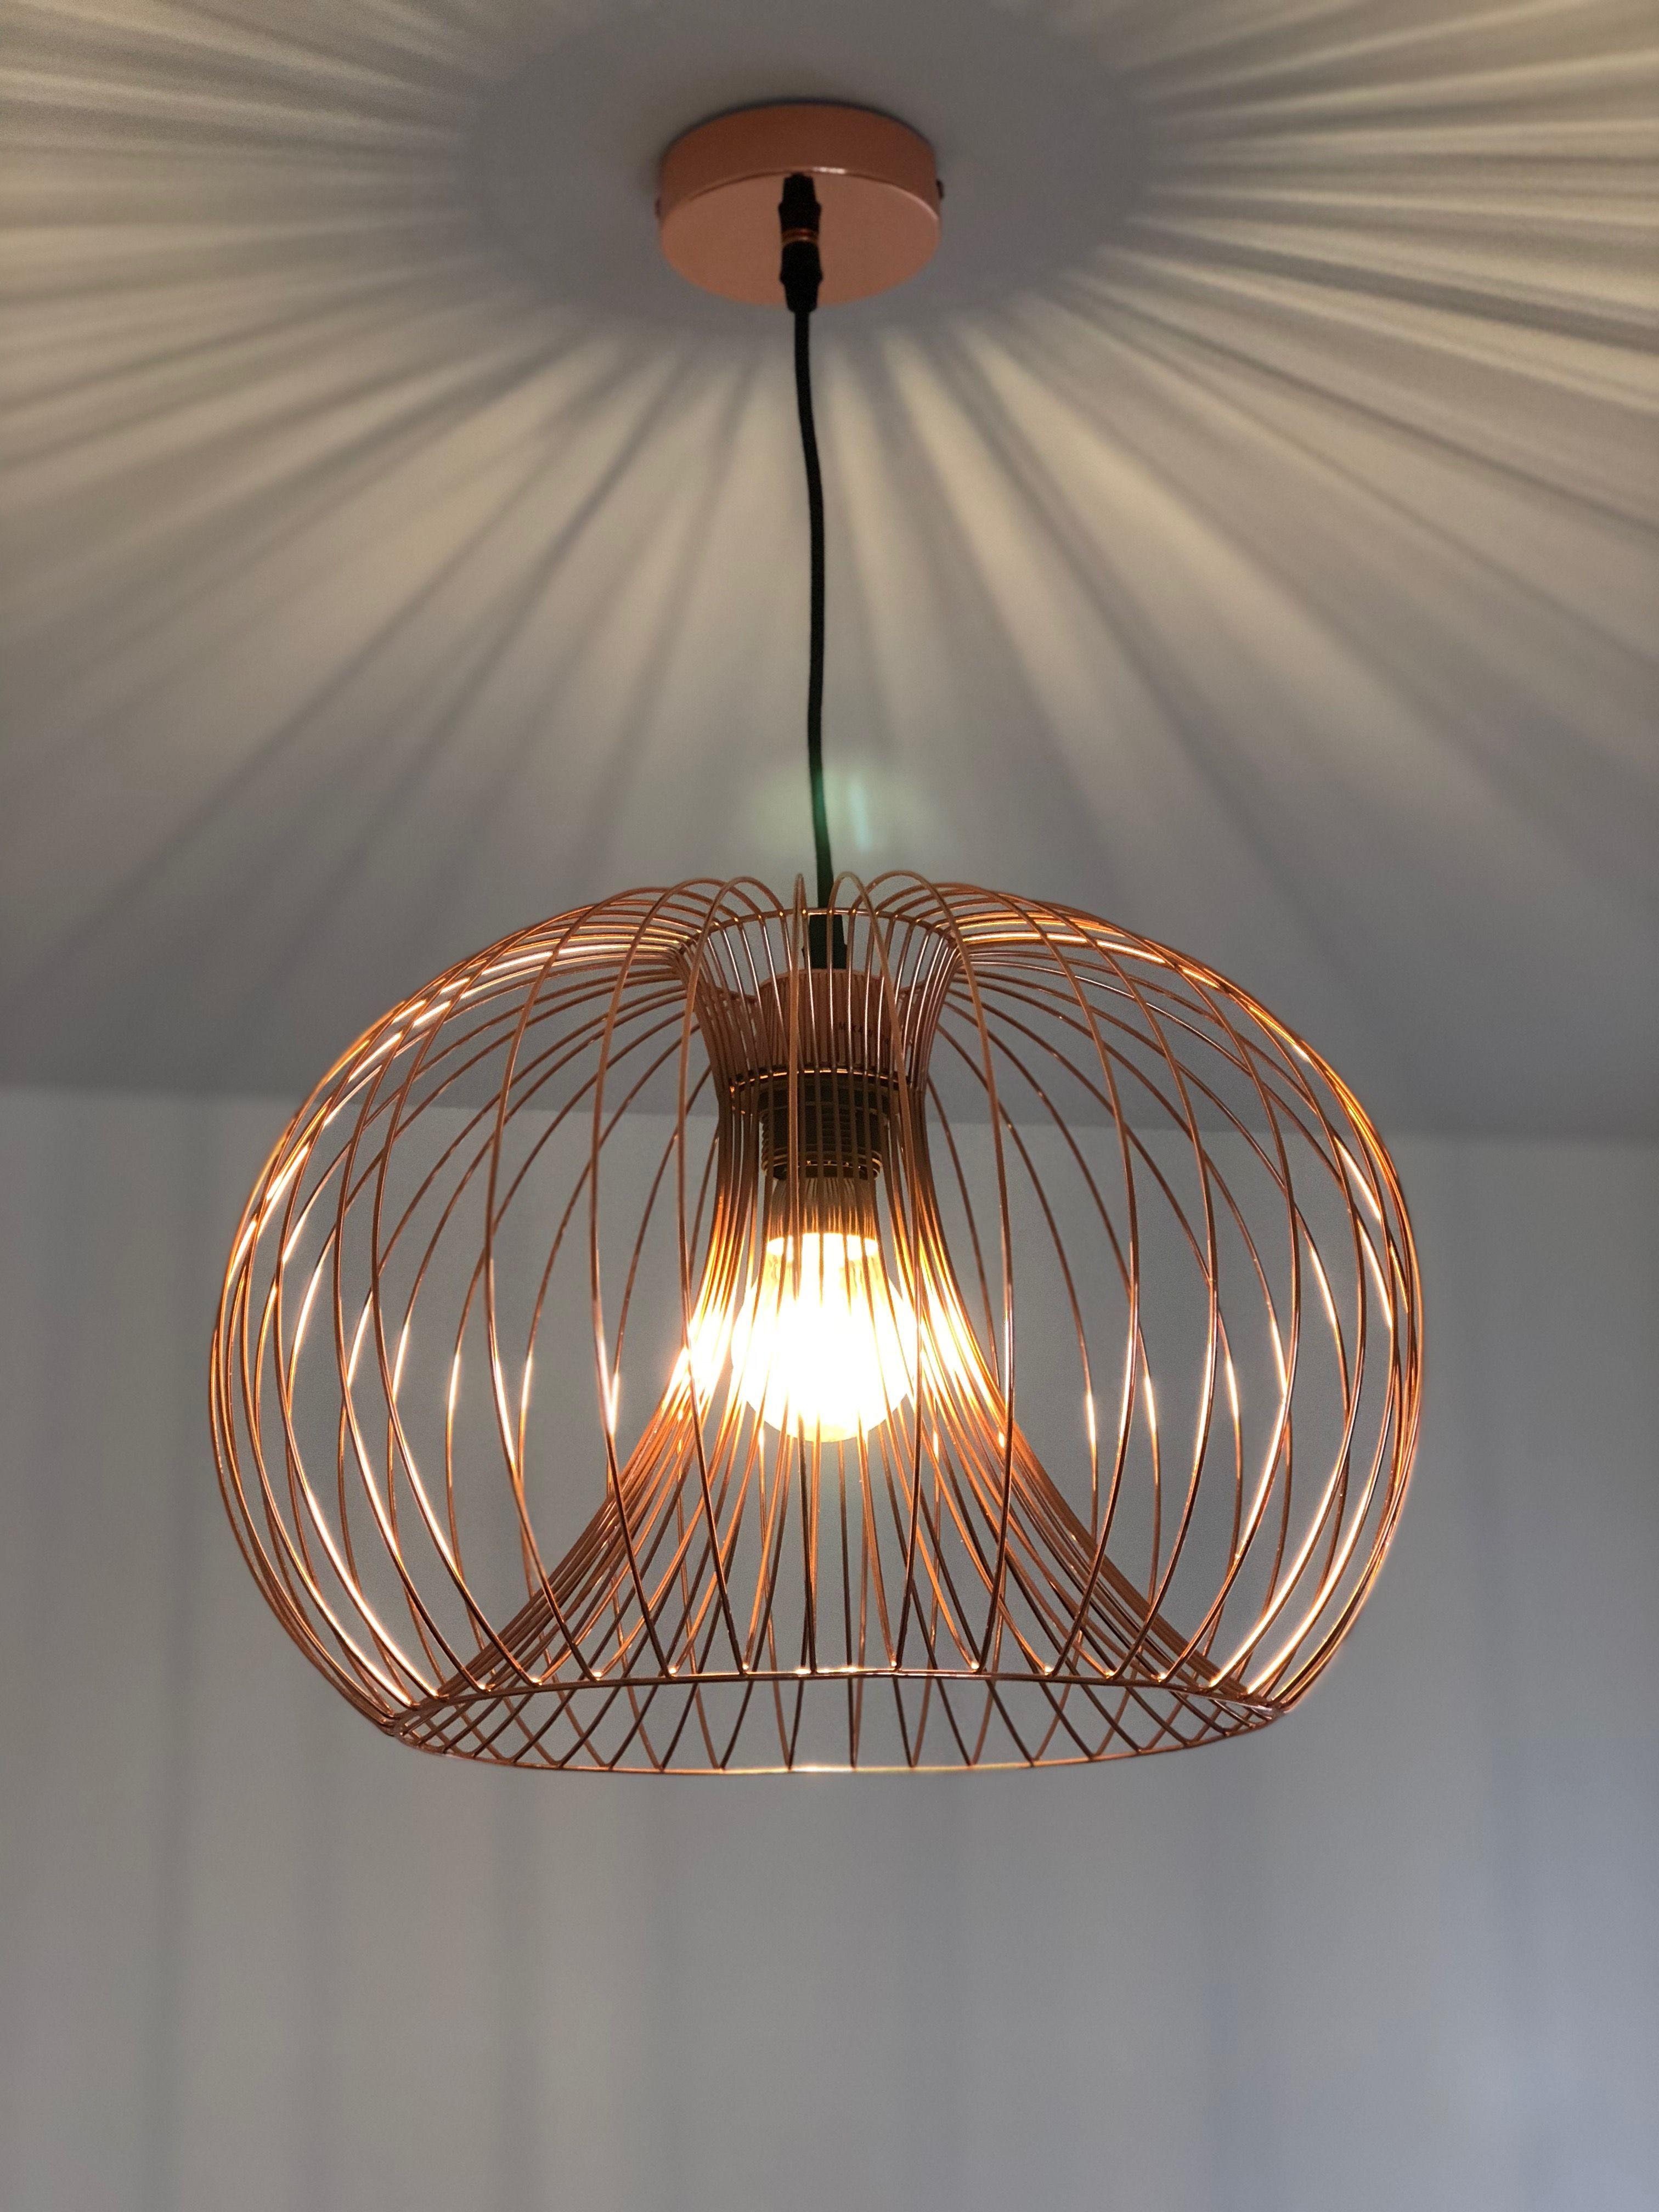 New Light In Dining Room From B Q Lights 2019